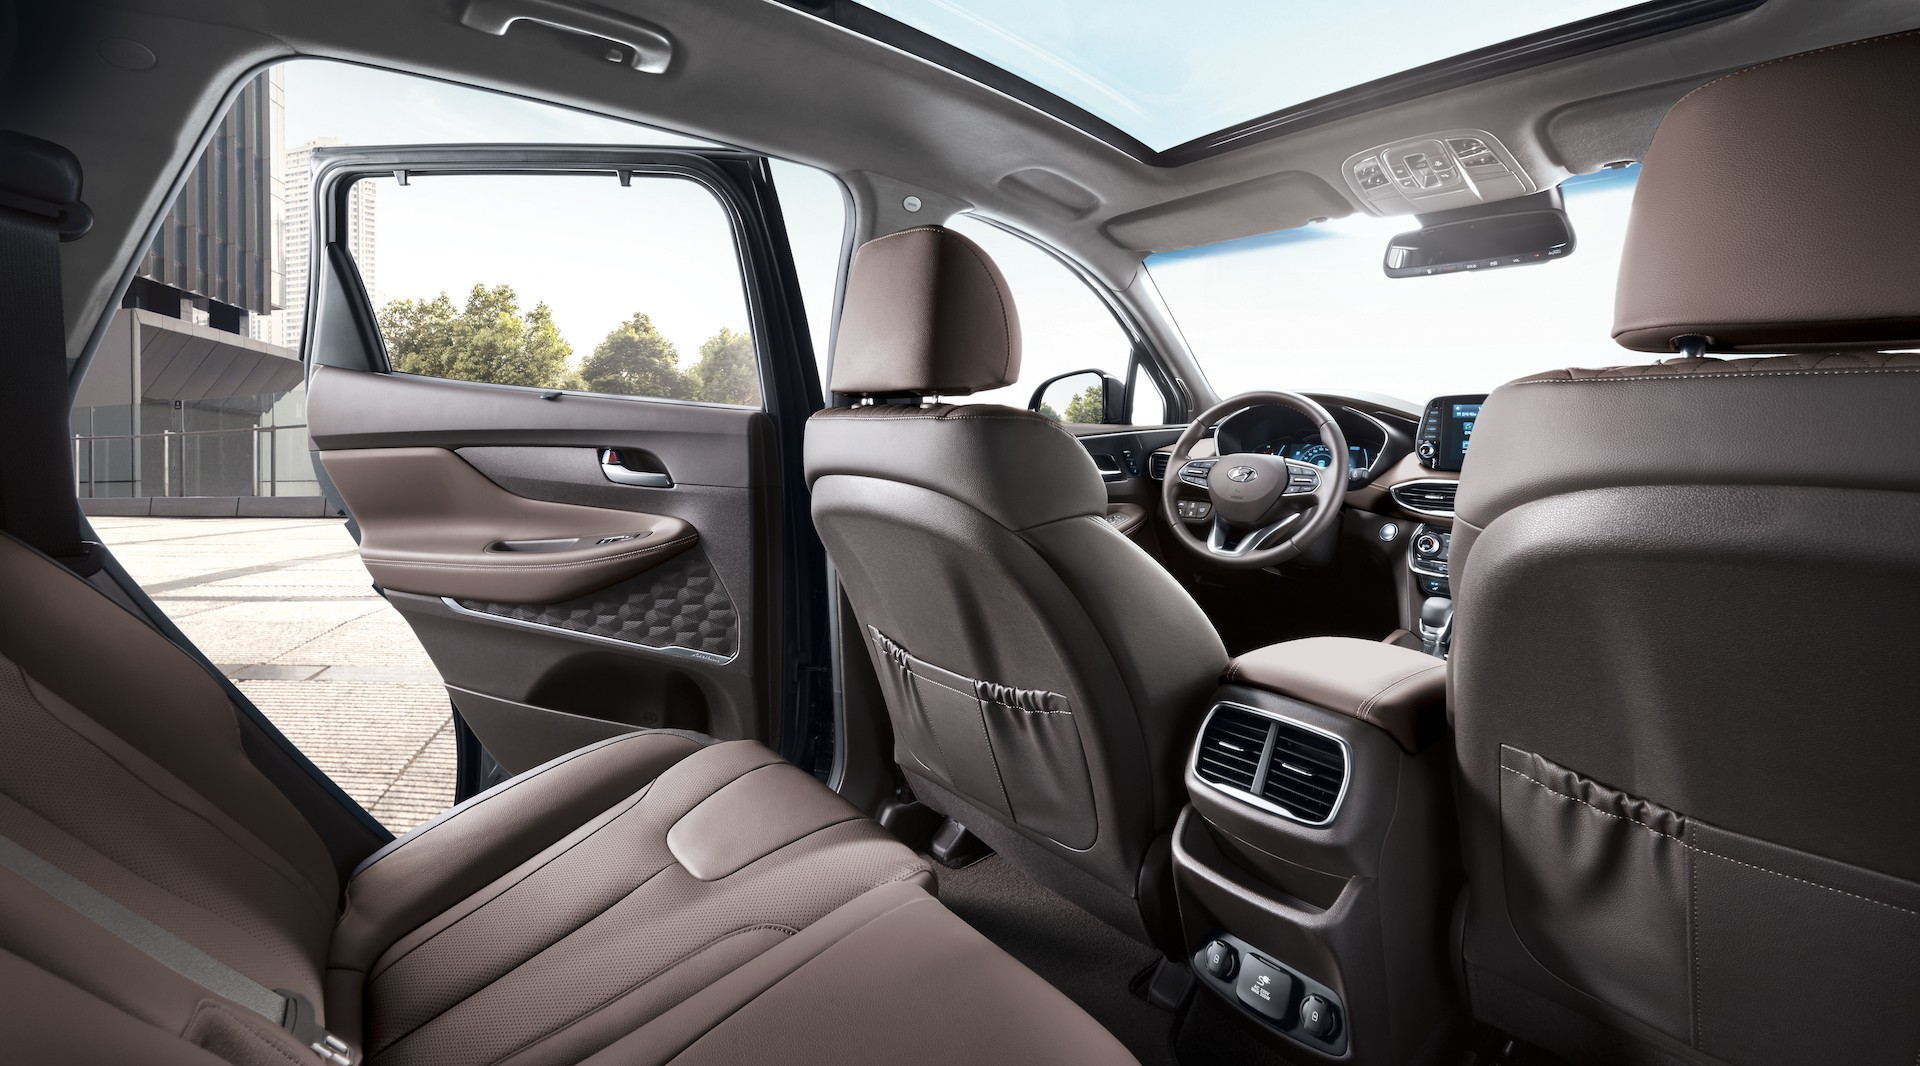 New Hyundai Santa Fe now has a sel engine